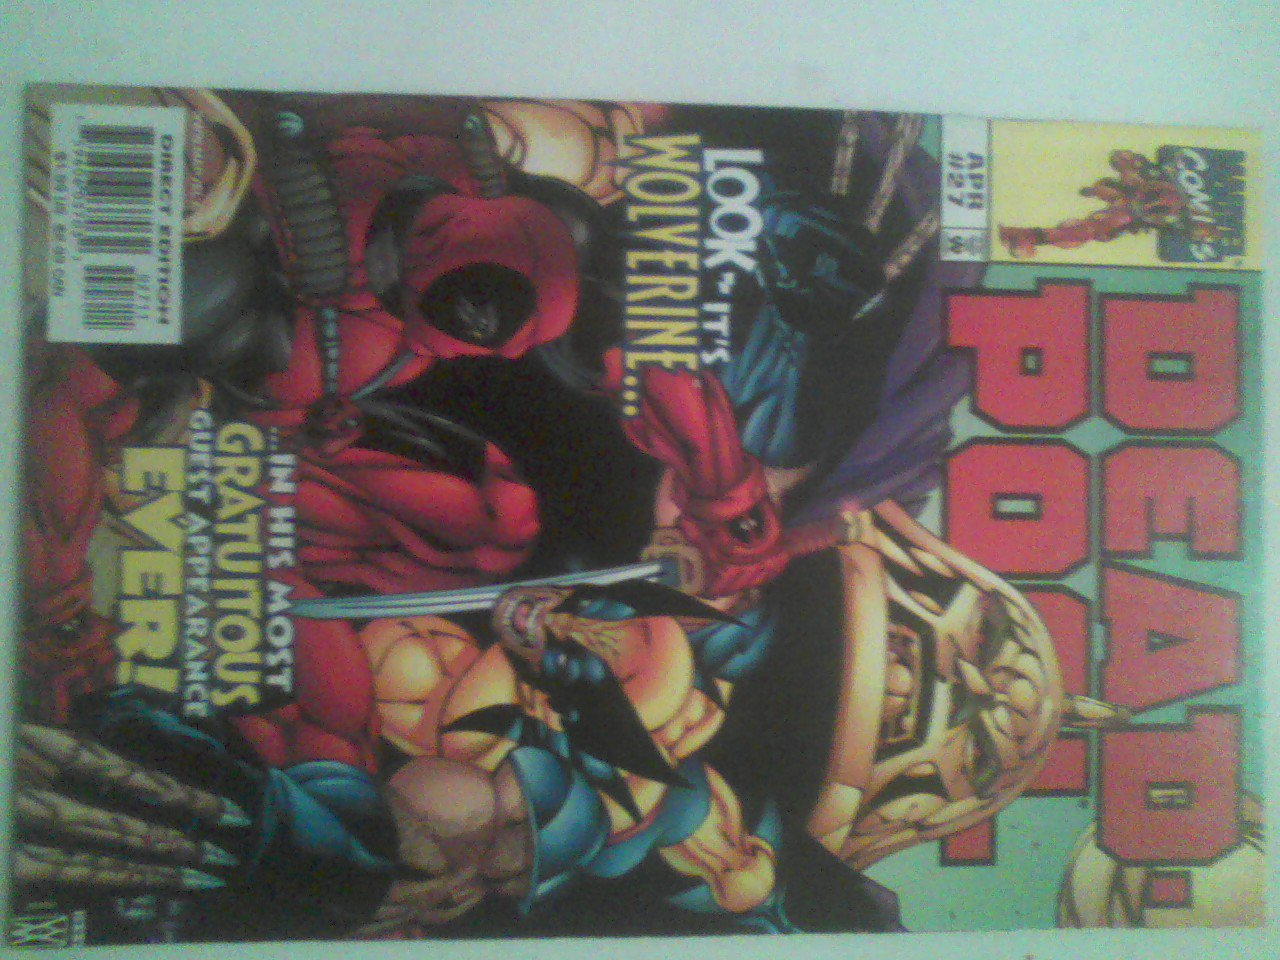 13 Deadpool lot . Guess Hulk,cable,Bullseye,taskmaster,wolverine,sirys,domino